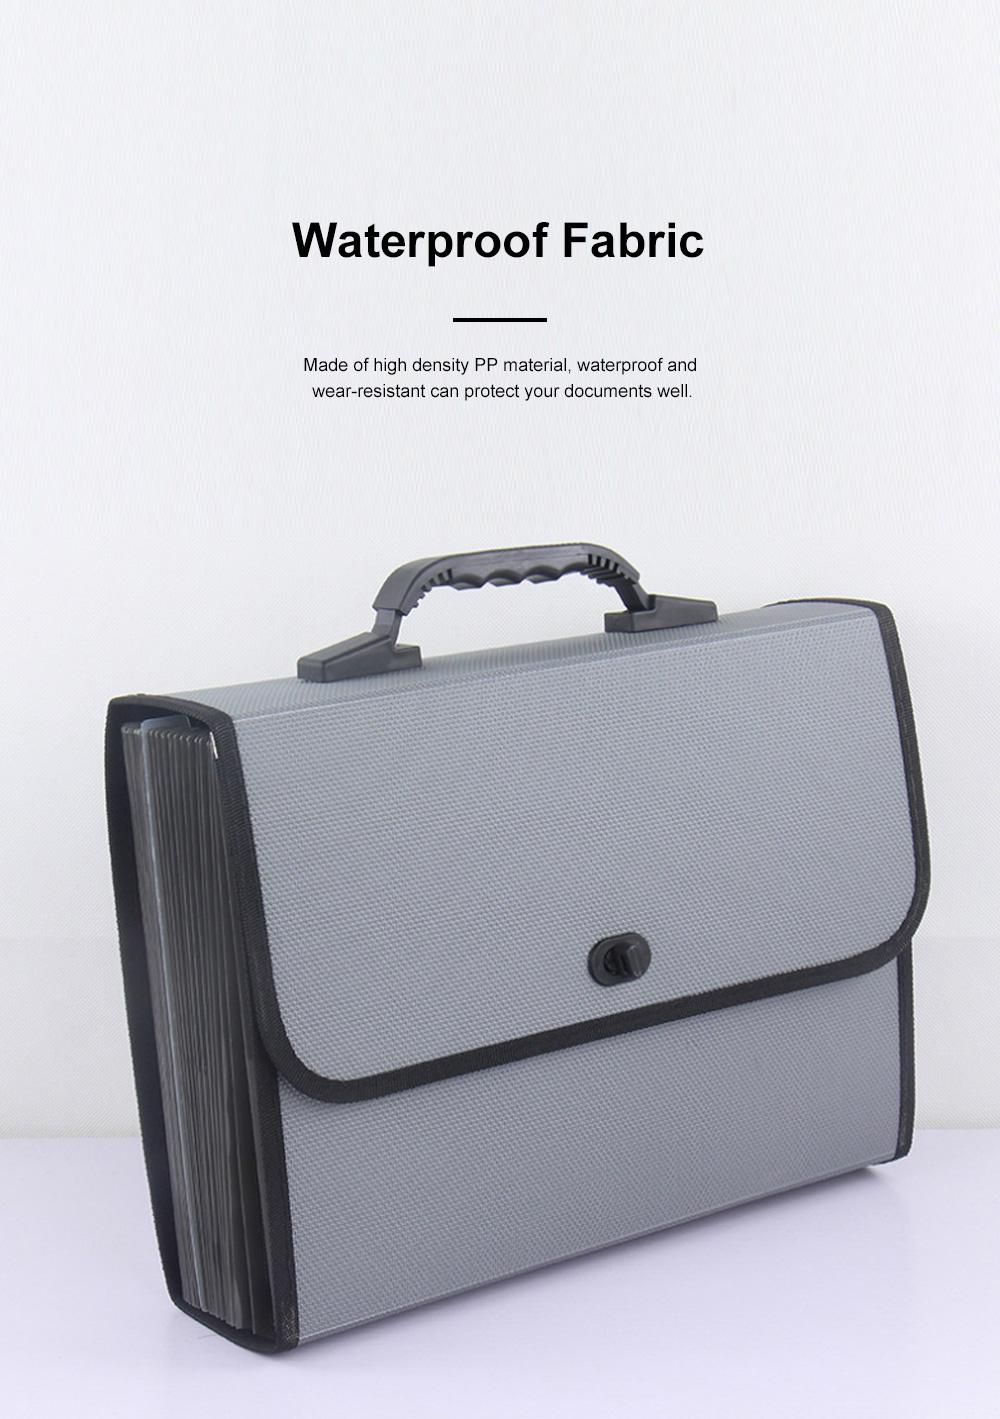 Portable Hand-held Knitted Organ Bag 26-tier Multi-tier Folders Office File Bag Paper File Bag 2